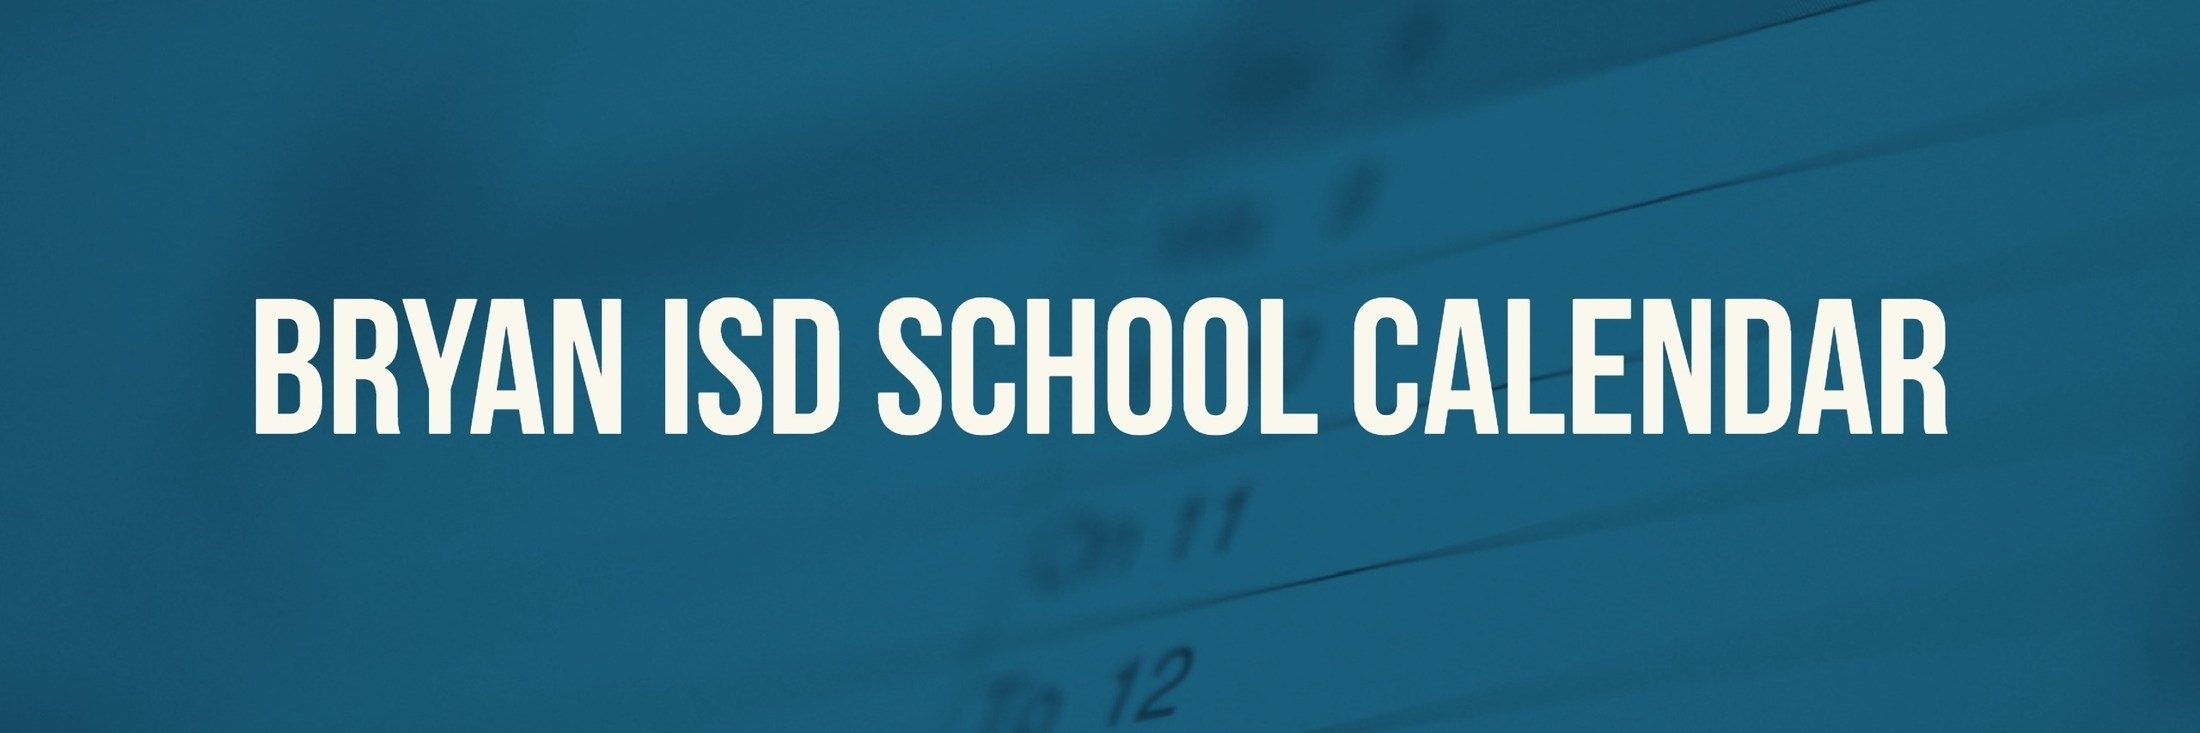 School Calendar, Testing & Fine Arts/athletics Events throughout Stephen F Austin 2019 2020 Calendar